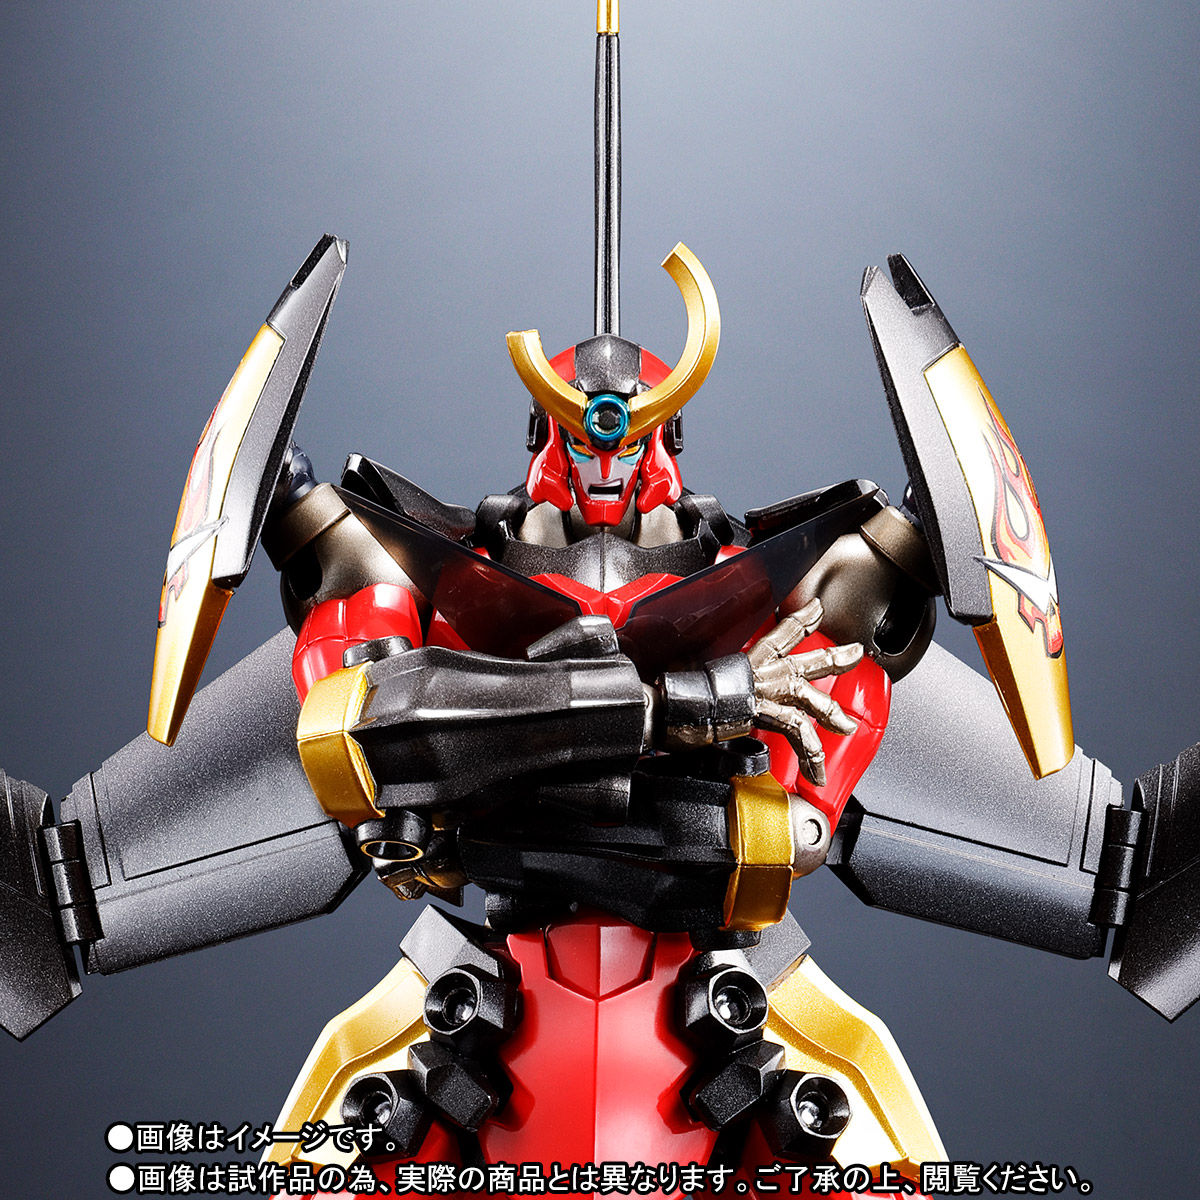 Super Robot Chogokin - Gurren Lagann 10th Anniversary Set (Limited Pre-order)